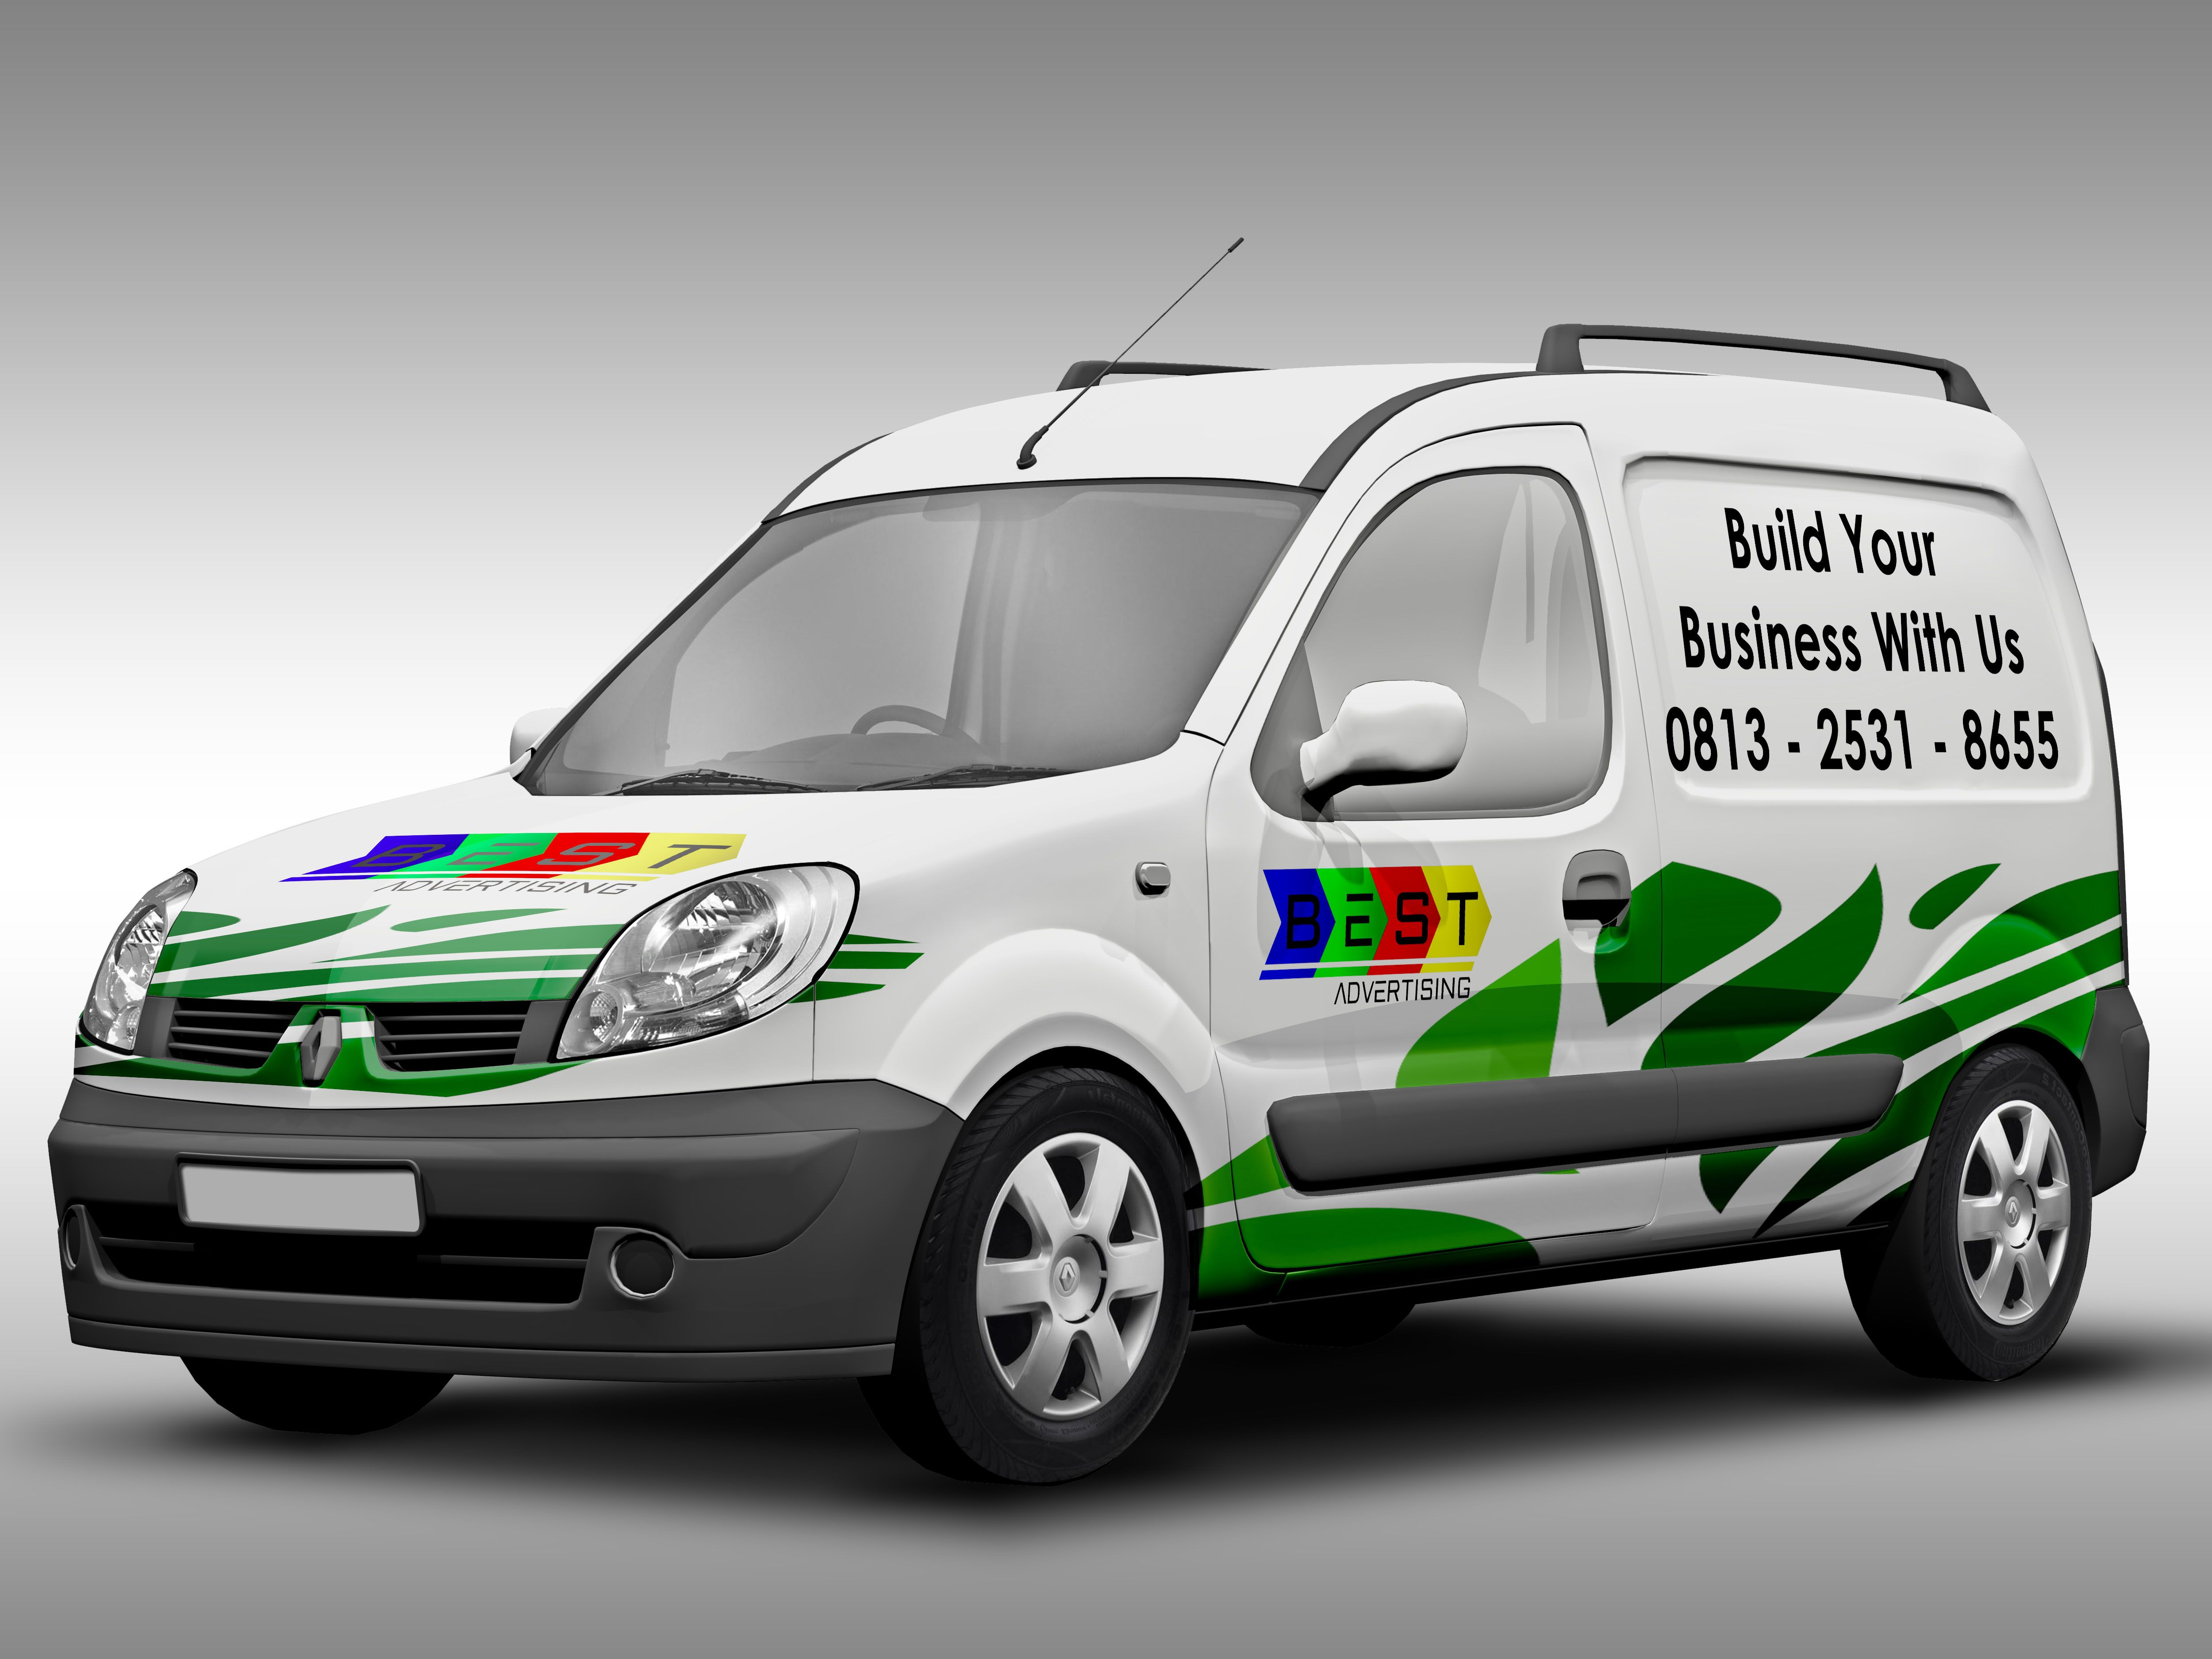 Branding Mobil Purwokero Branding Mockups Free Branding Mockups Car Brands